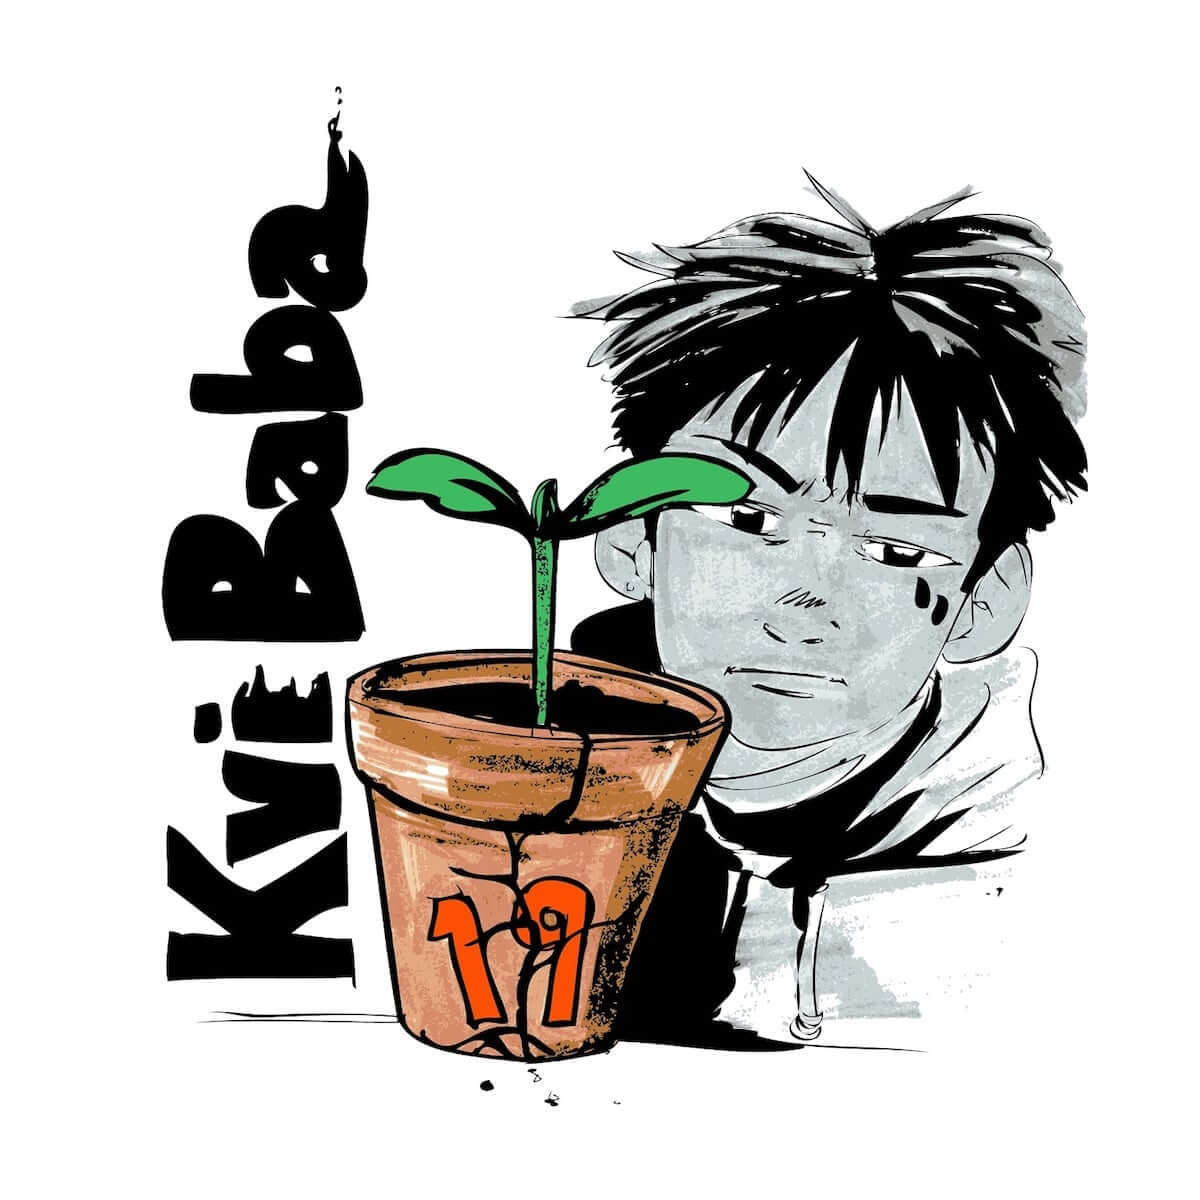 Kvi Baba、SALUを迎えた新曲2nd EP『19』収録曲「A Bright」のMVを公開 music190308-kvibaba-1-1200x1200